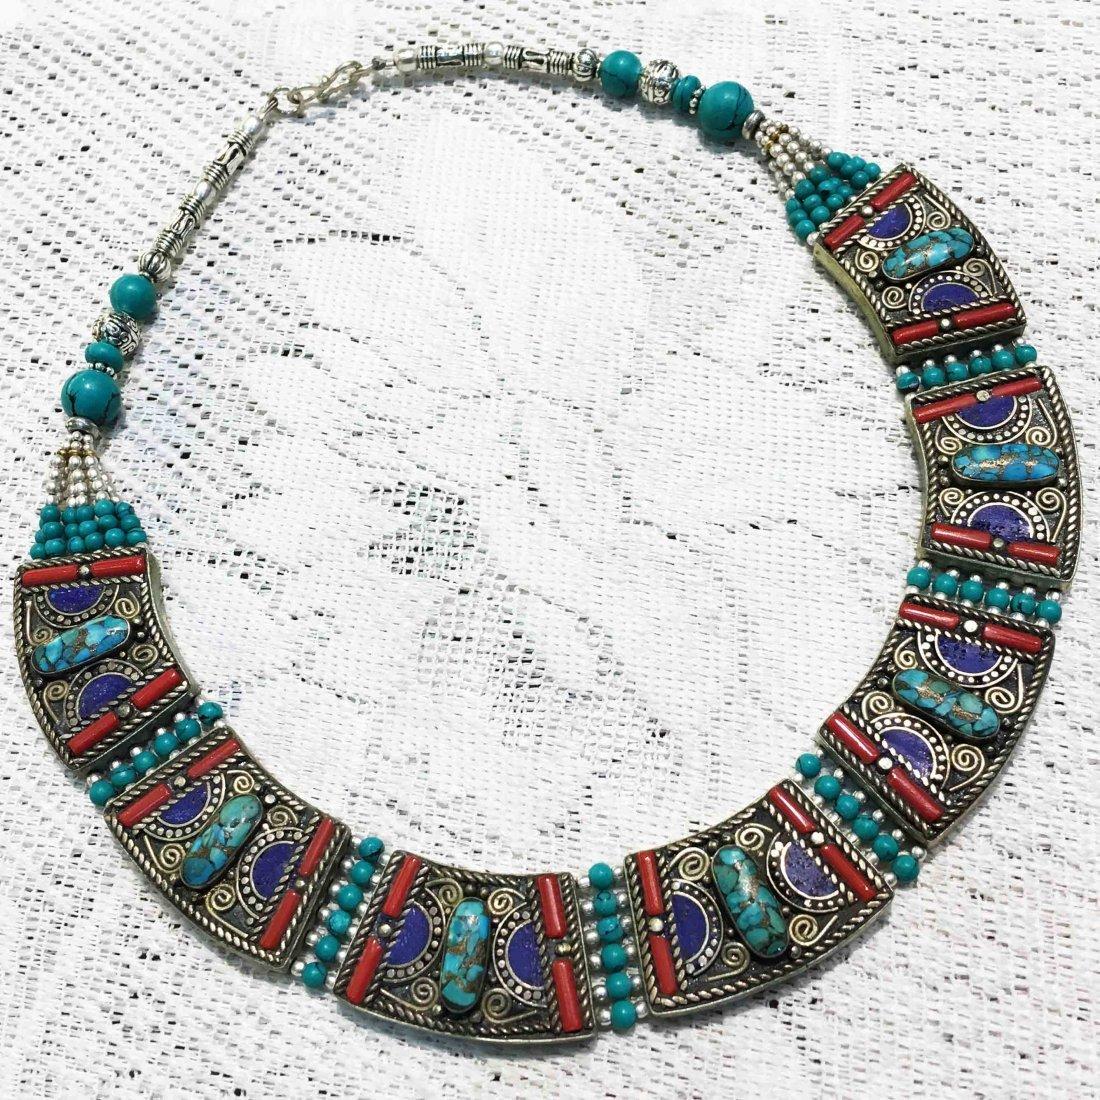 Handmade Tibetan Turquoise & Coral Necklace